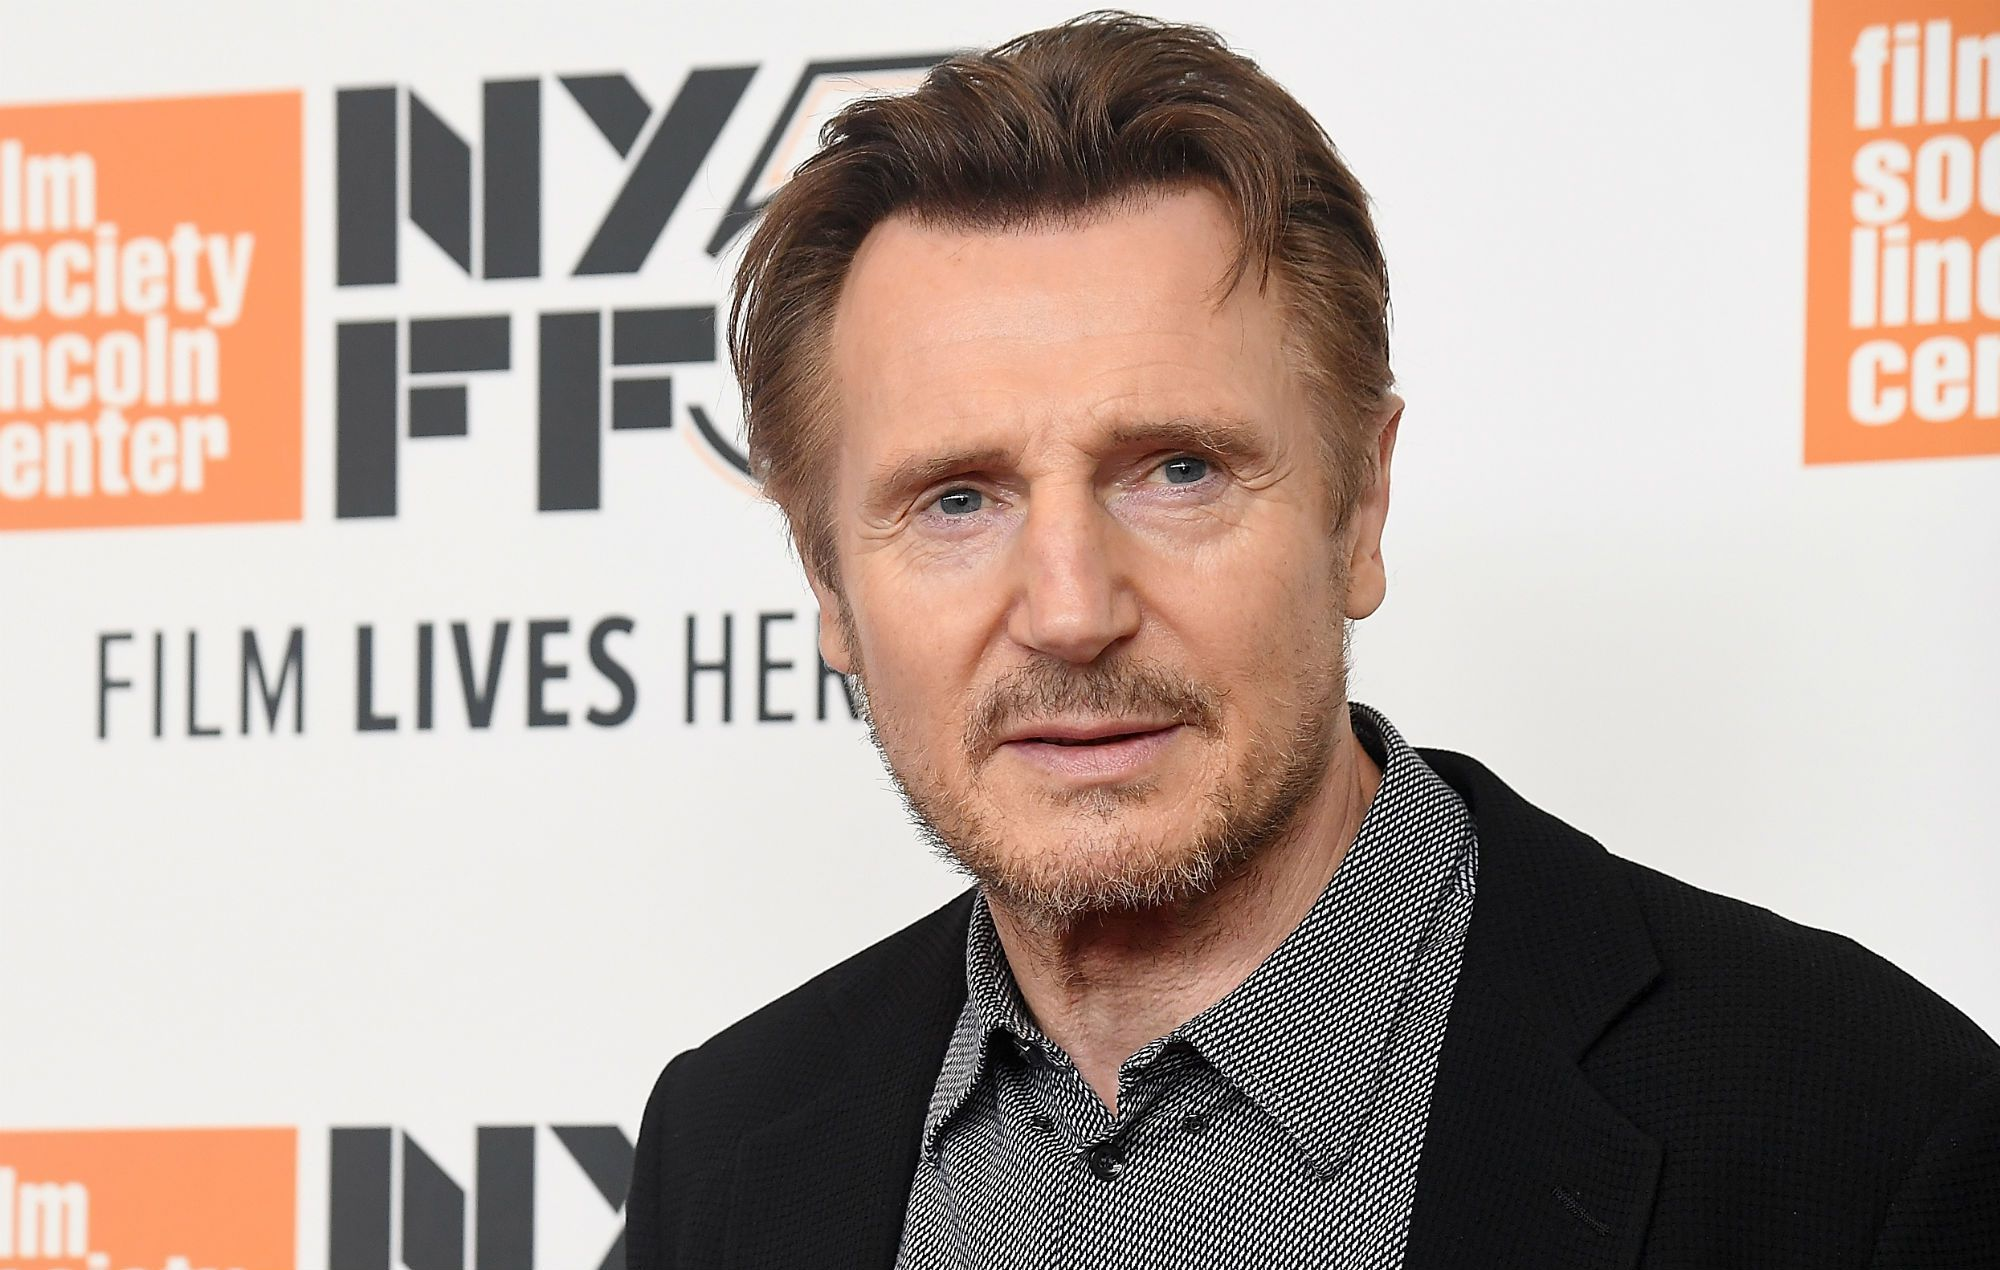 Se cancela premiere de película de Liam Neeson tras racismo